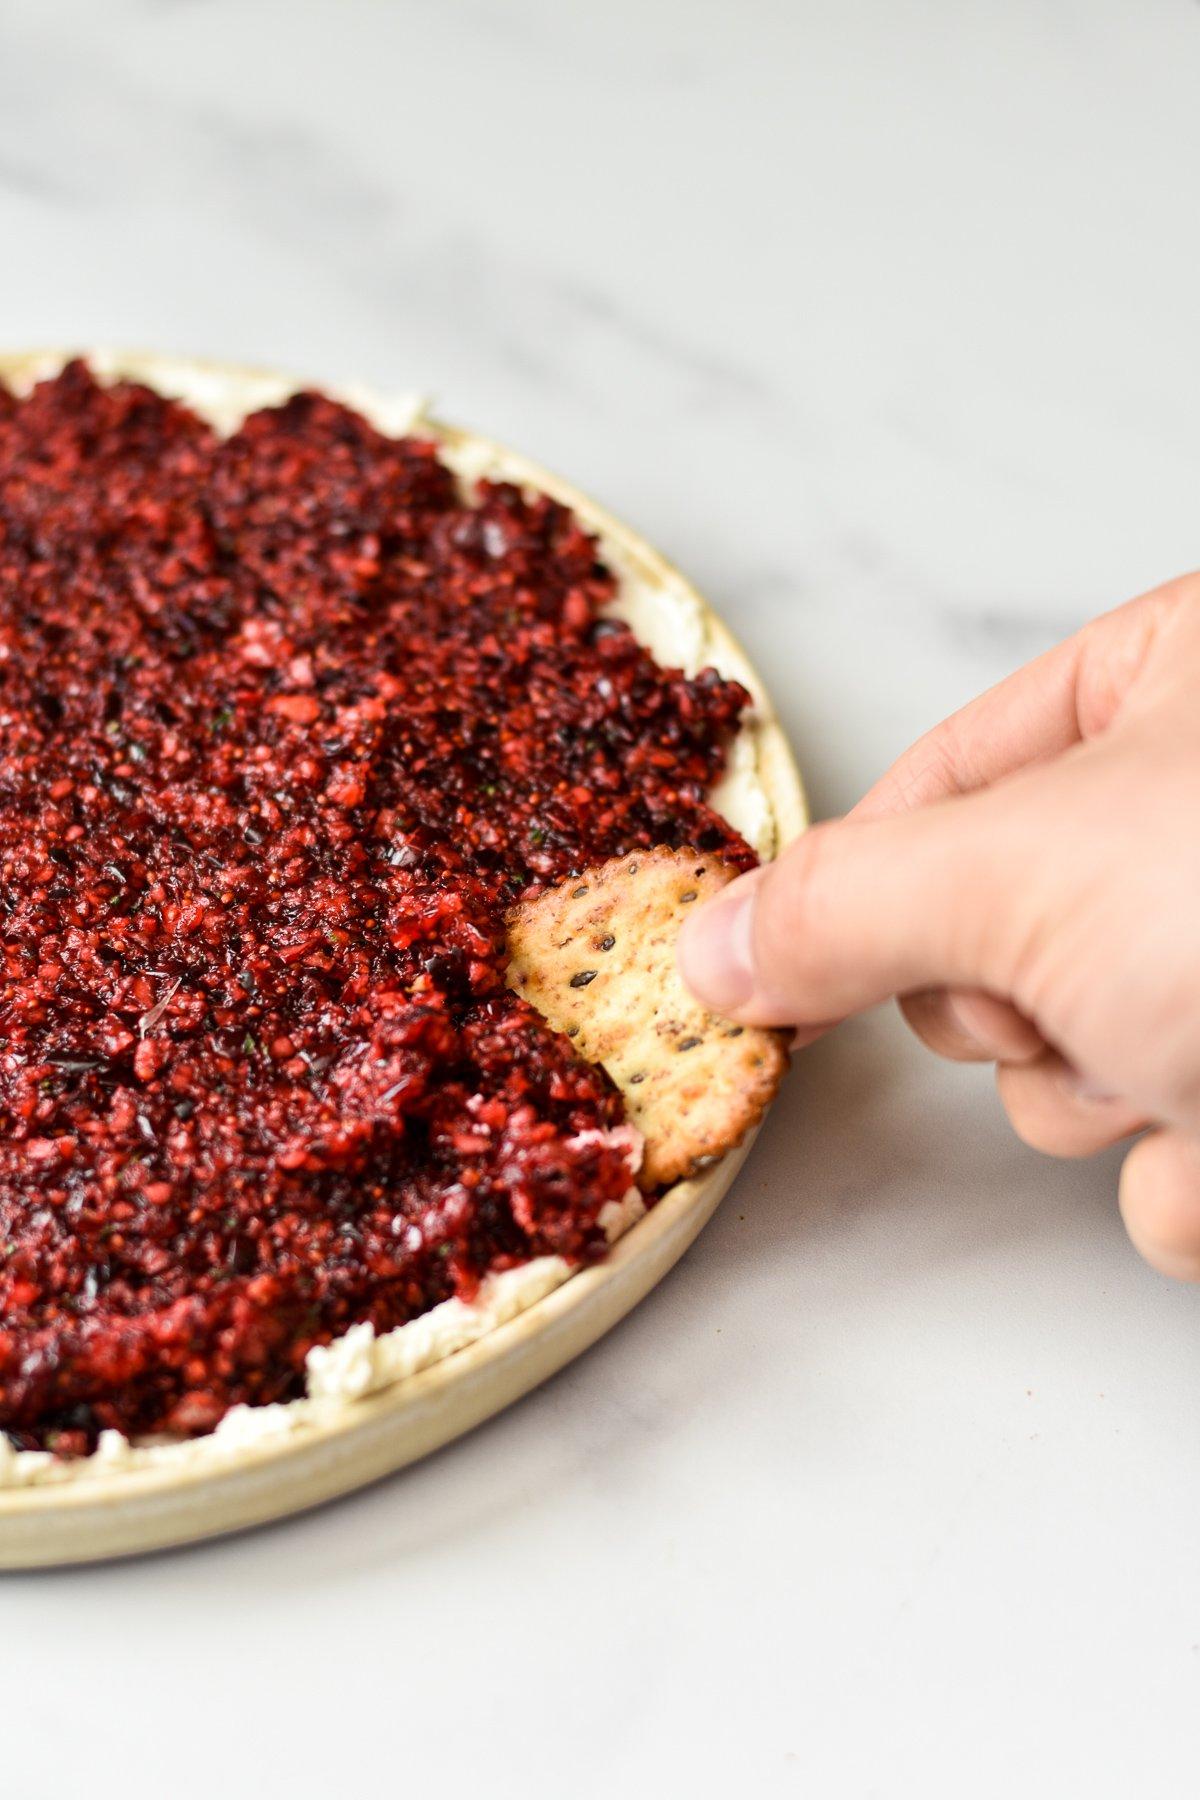 dipping a cracker into jalapeno cranberry dip